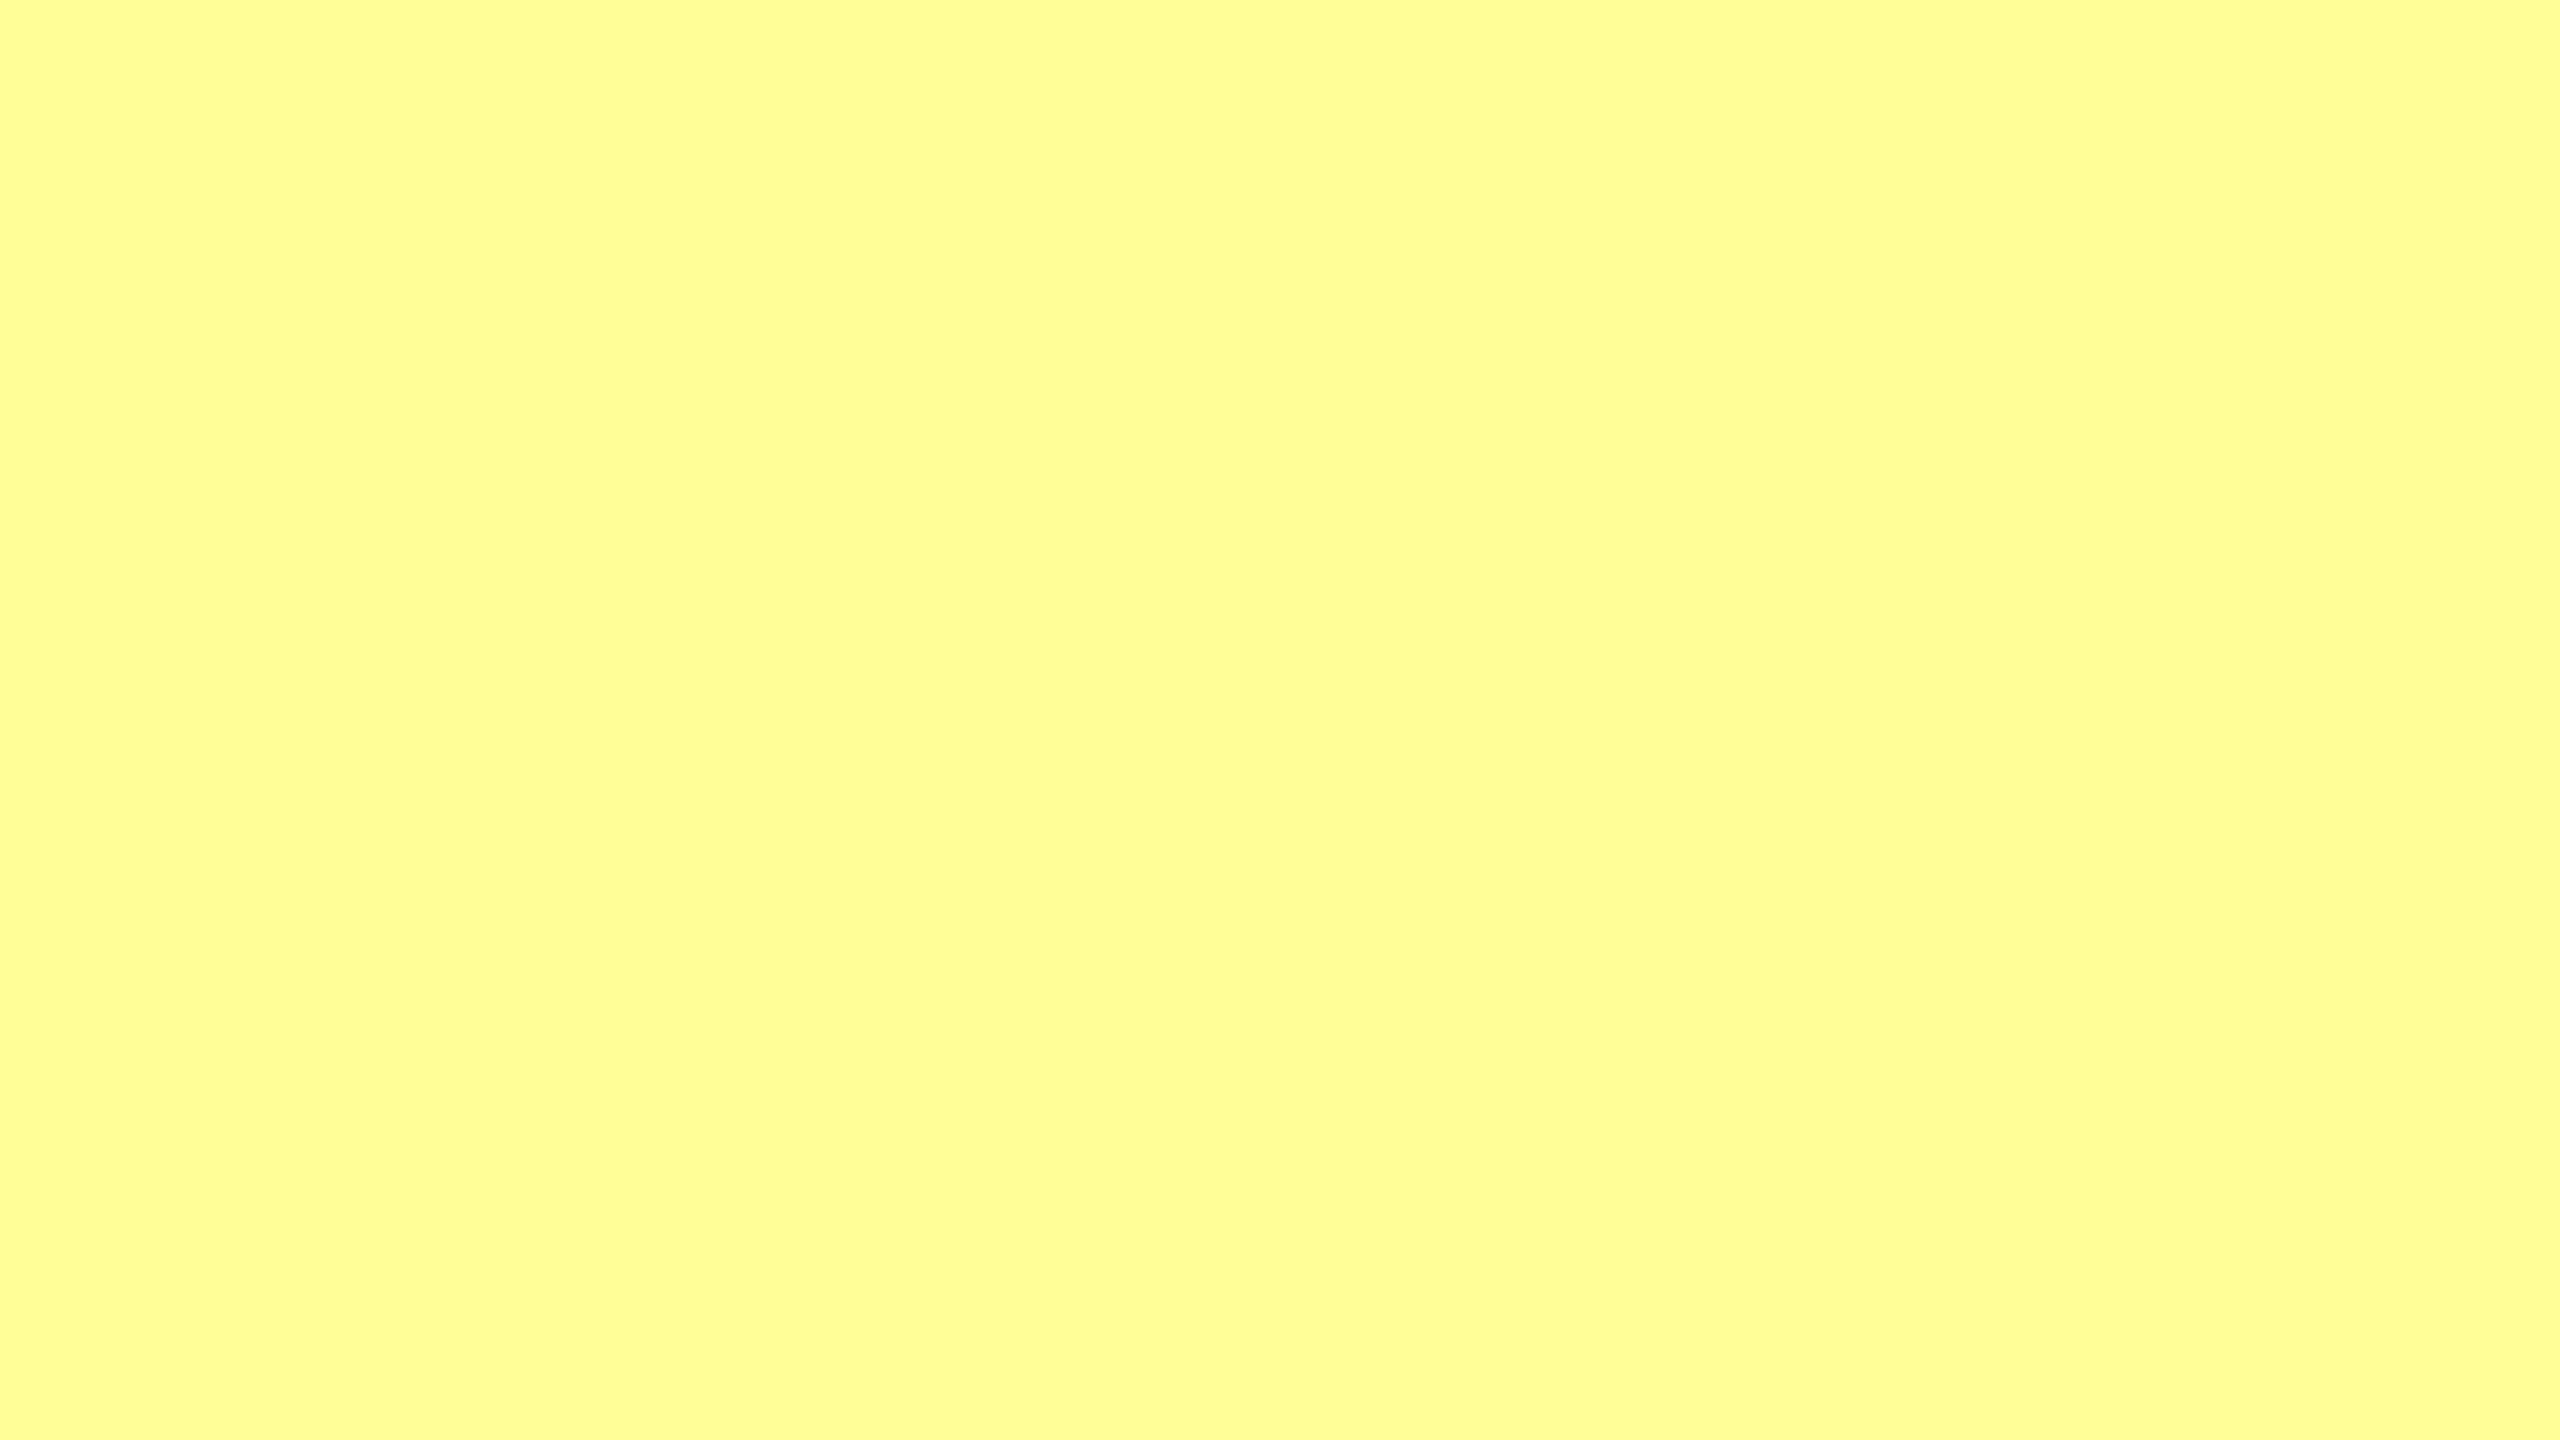 Kumpulan Pastel Yellow Wallpaper Growtopia Download Kumpulan